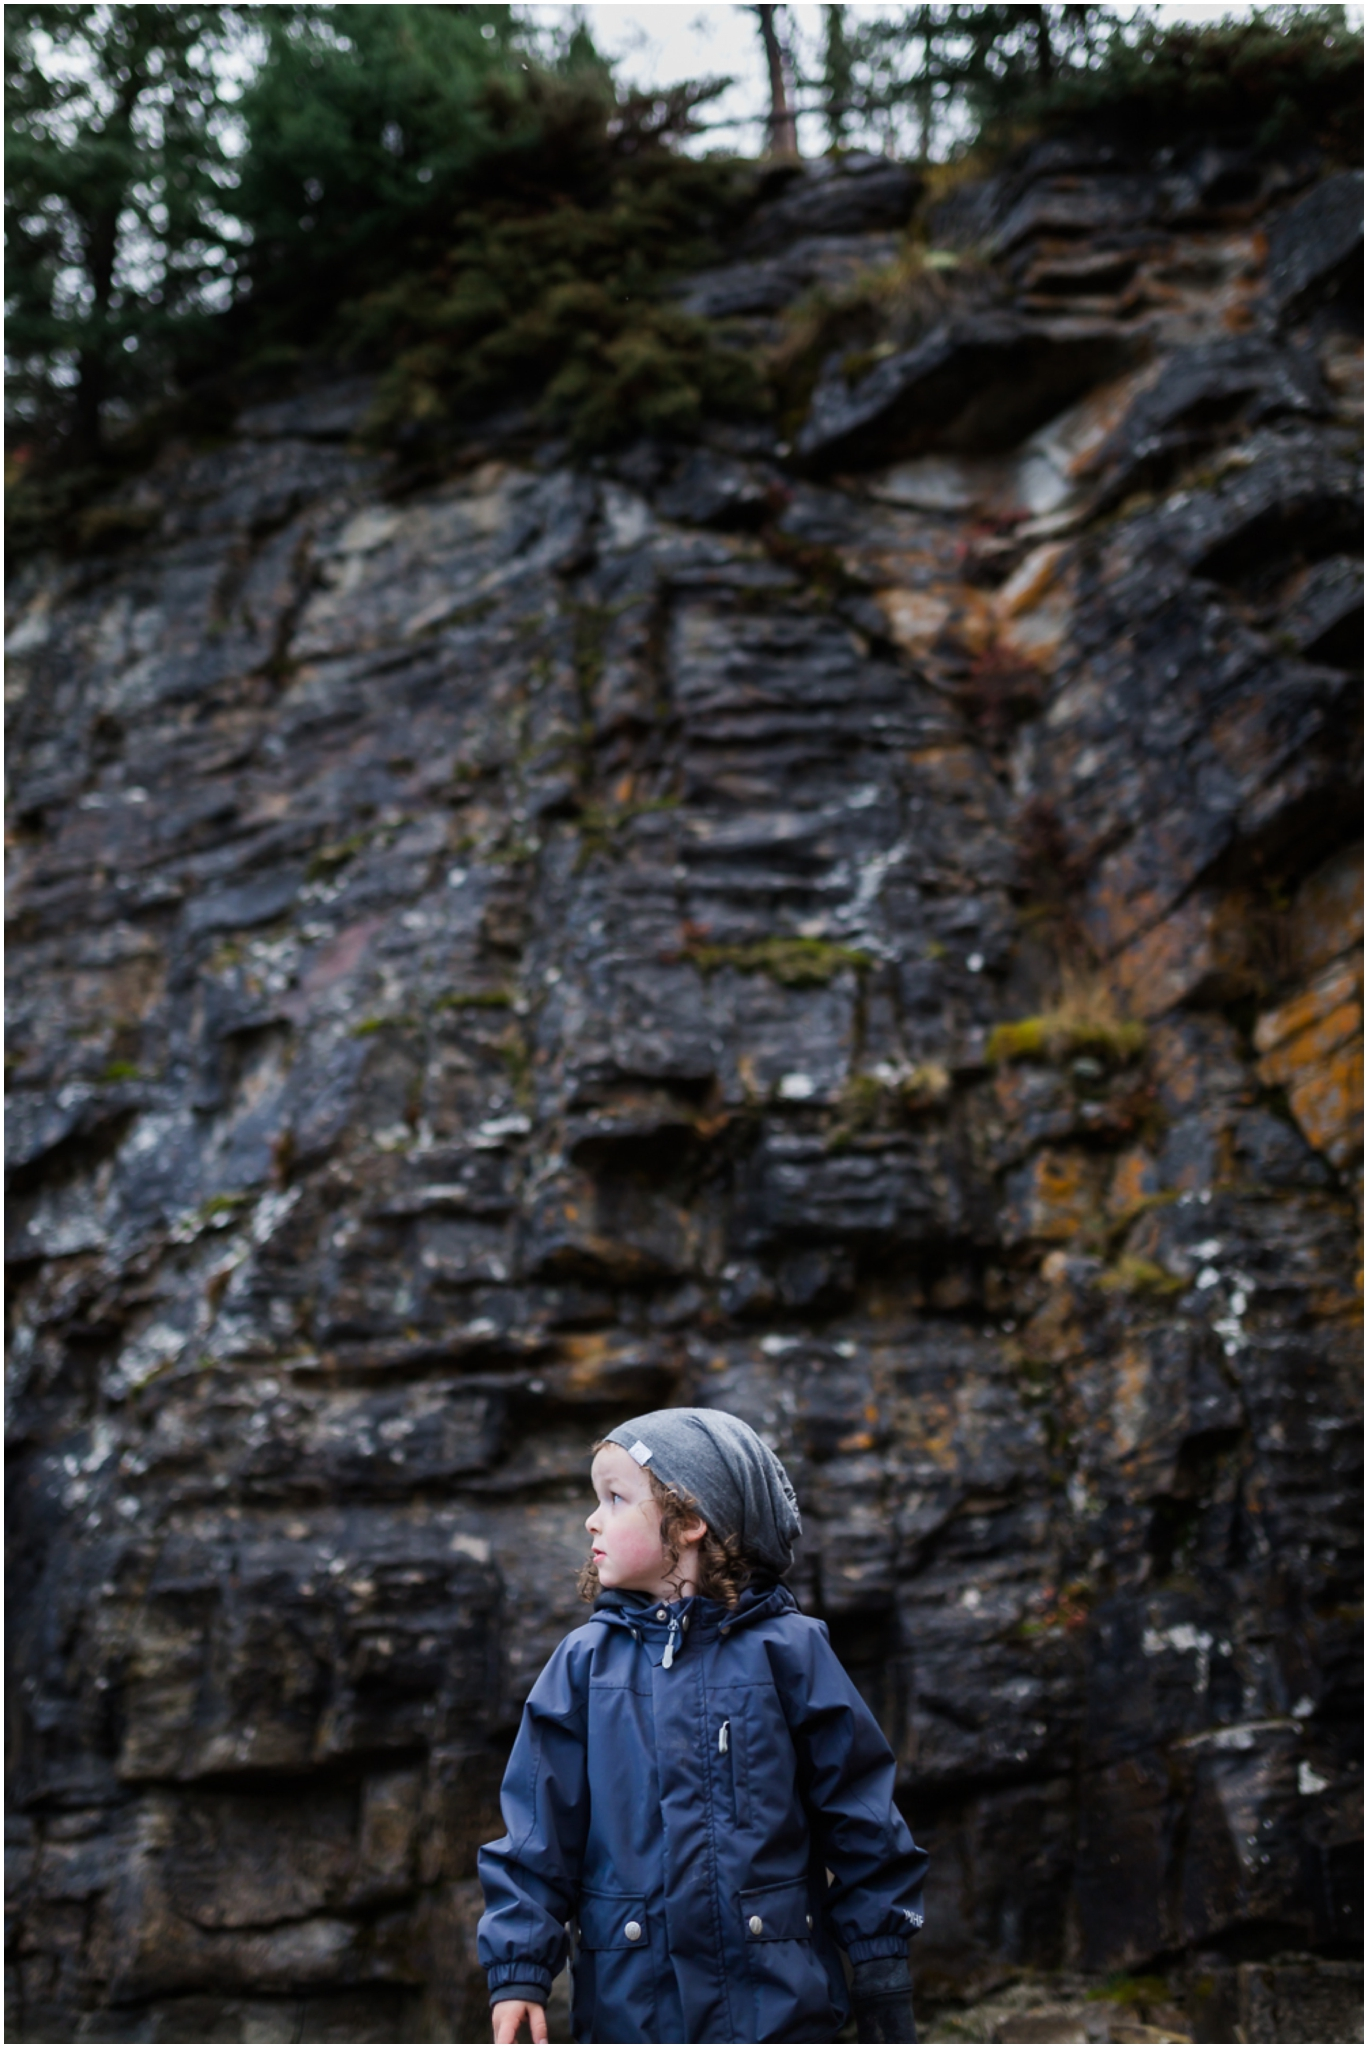 Edmonton Child photographer - Best of 2016 - Athabasca Falls - Jasper Alberta - Travel Alberta